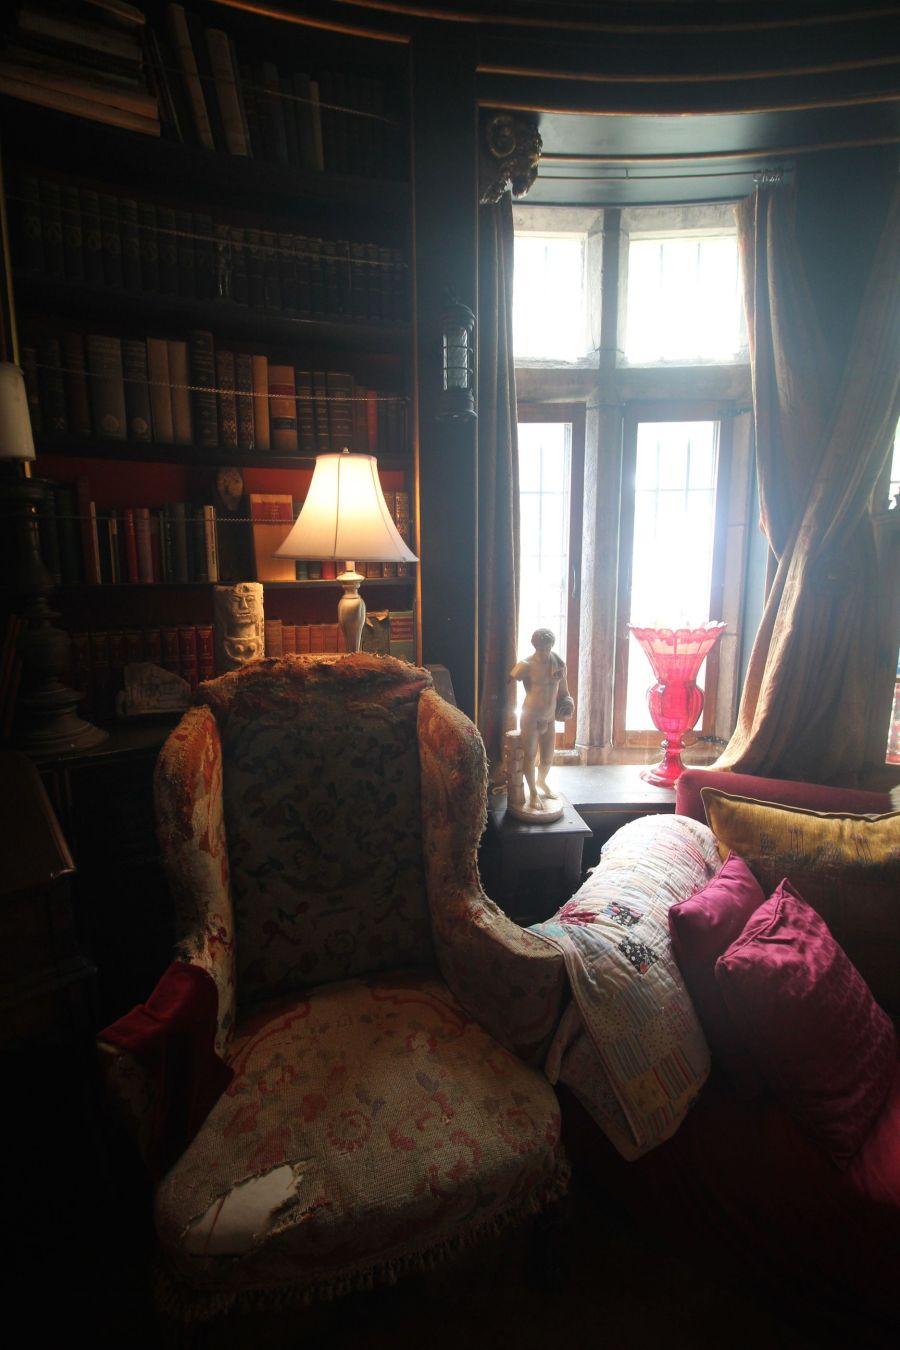 gloucester hammond castle interior circular library 3